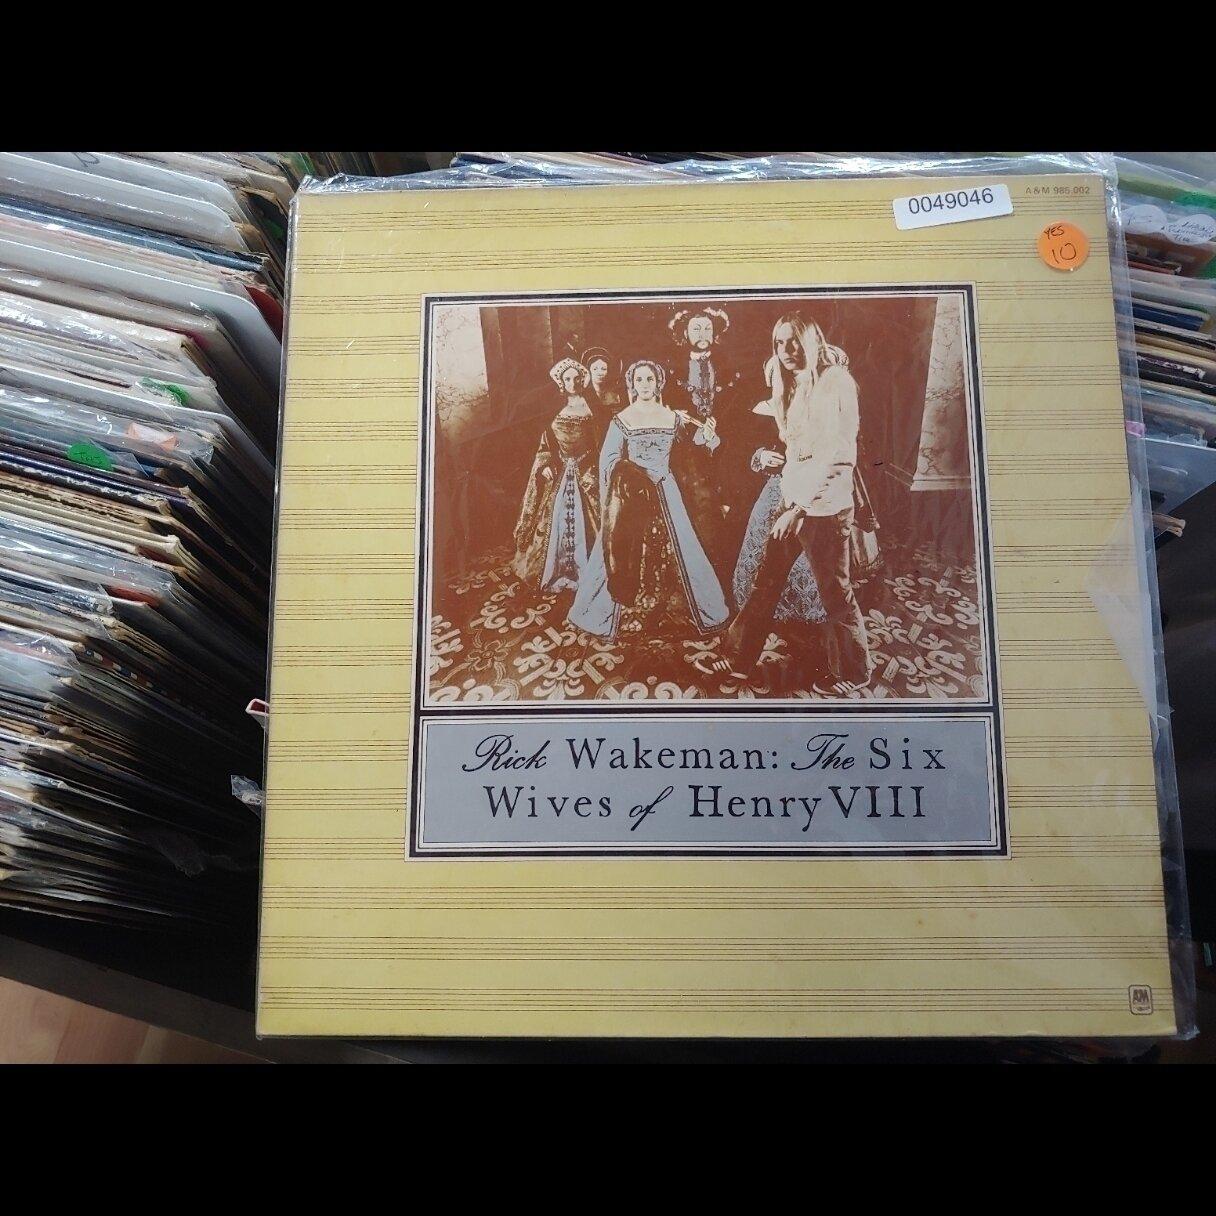 Wakeman, Rick: The Six Wives of HenryVIII